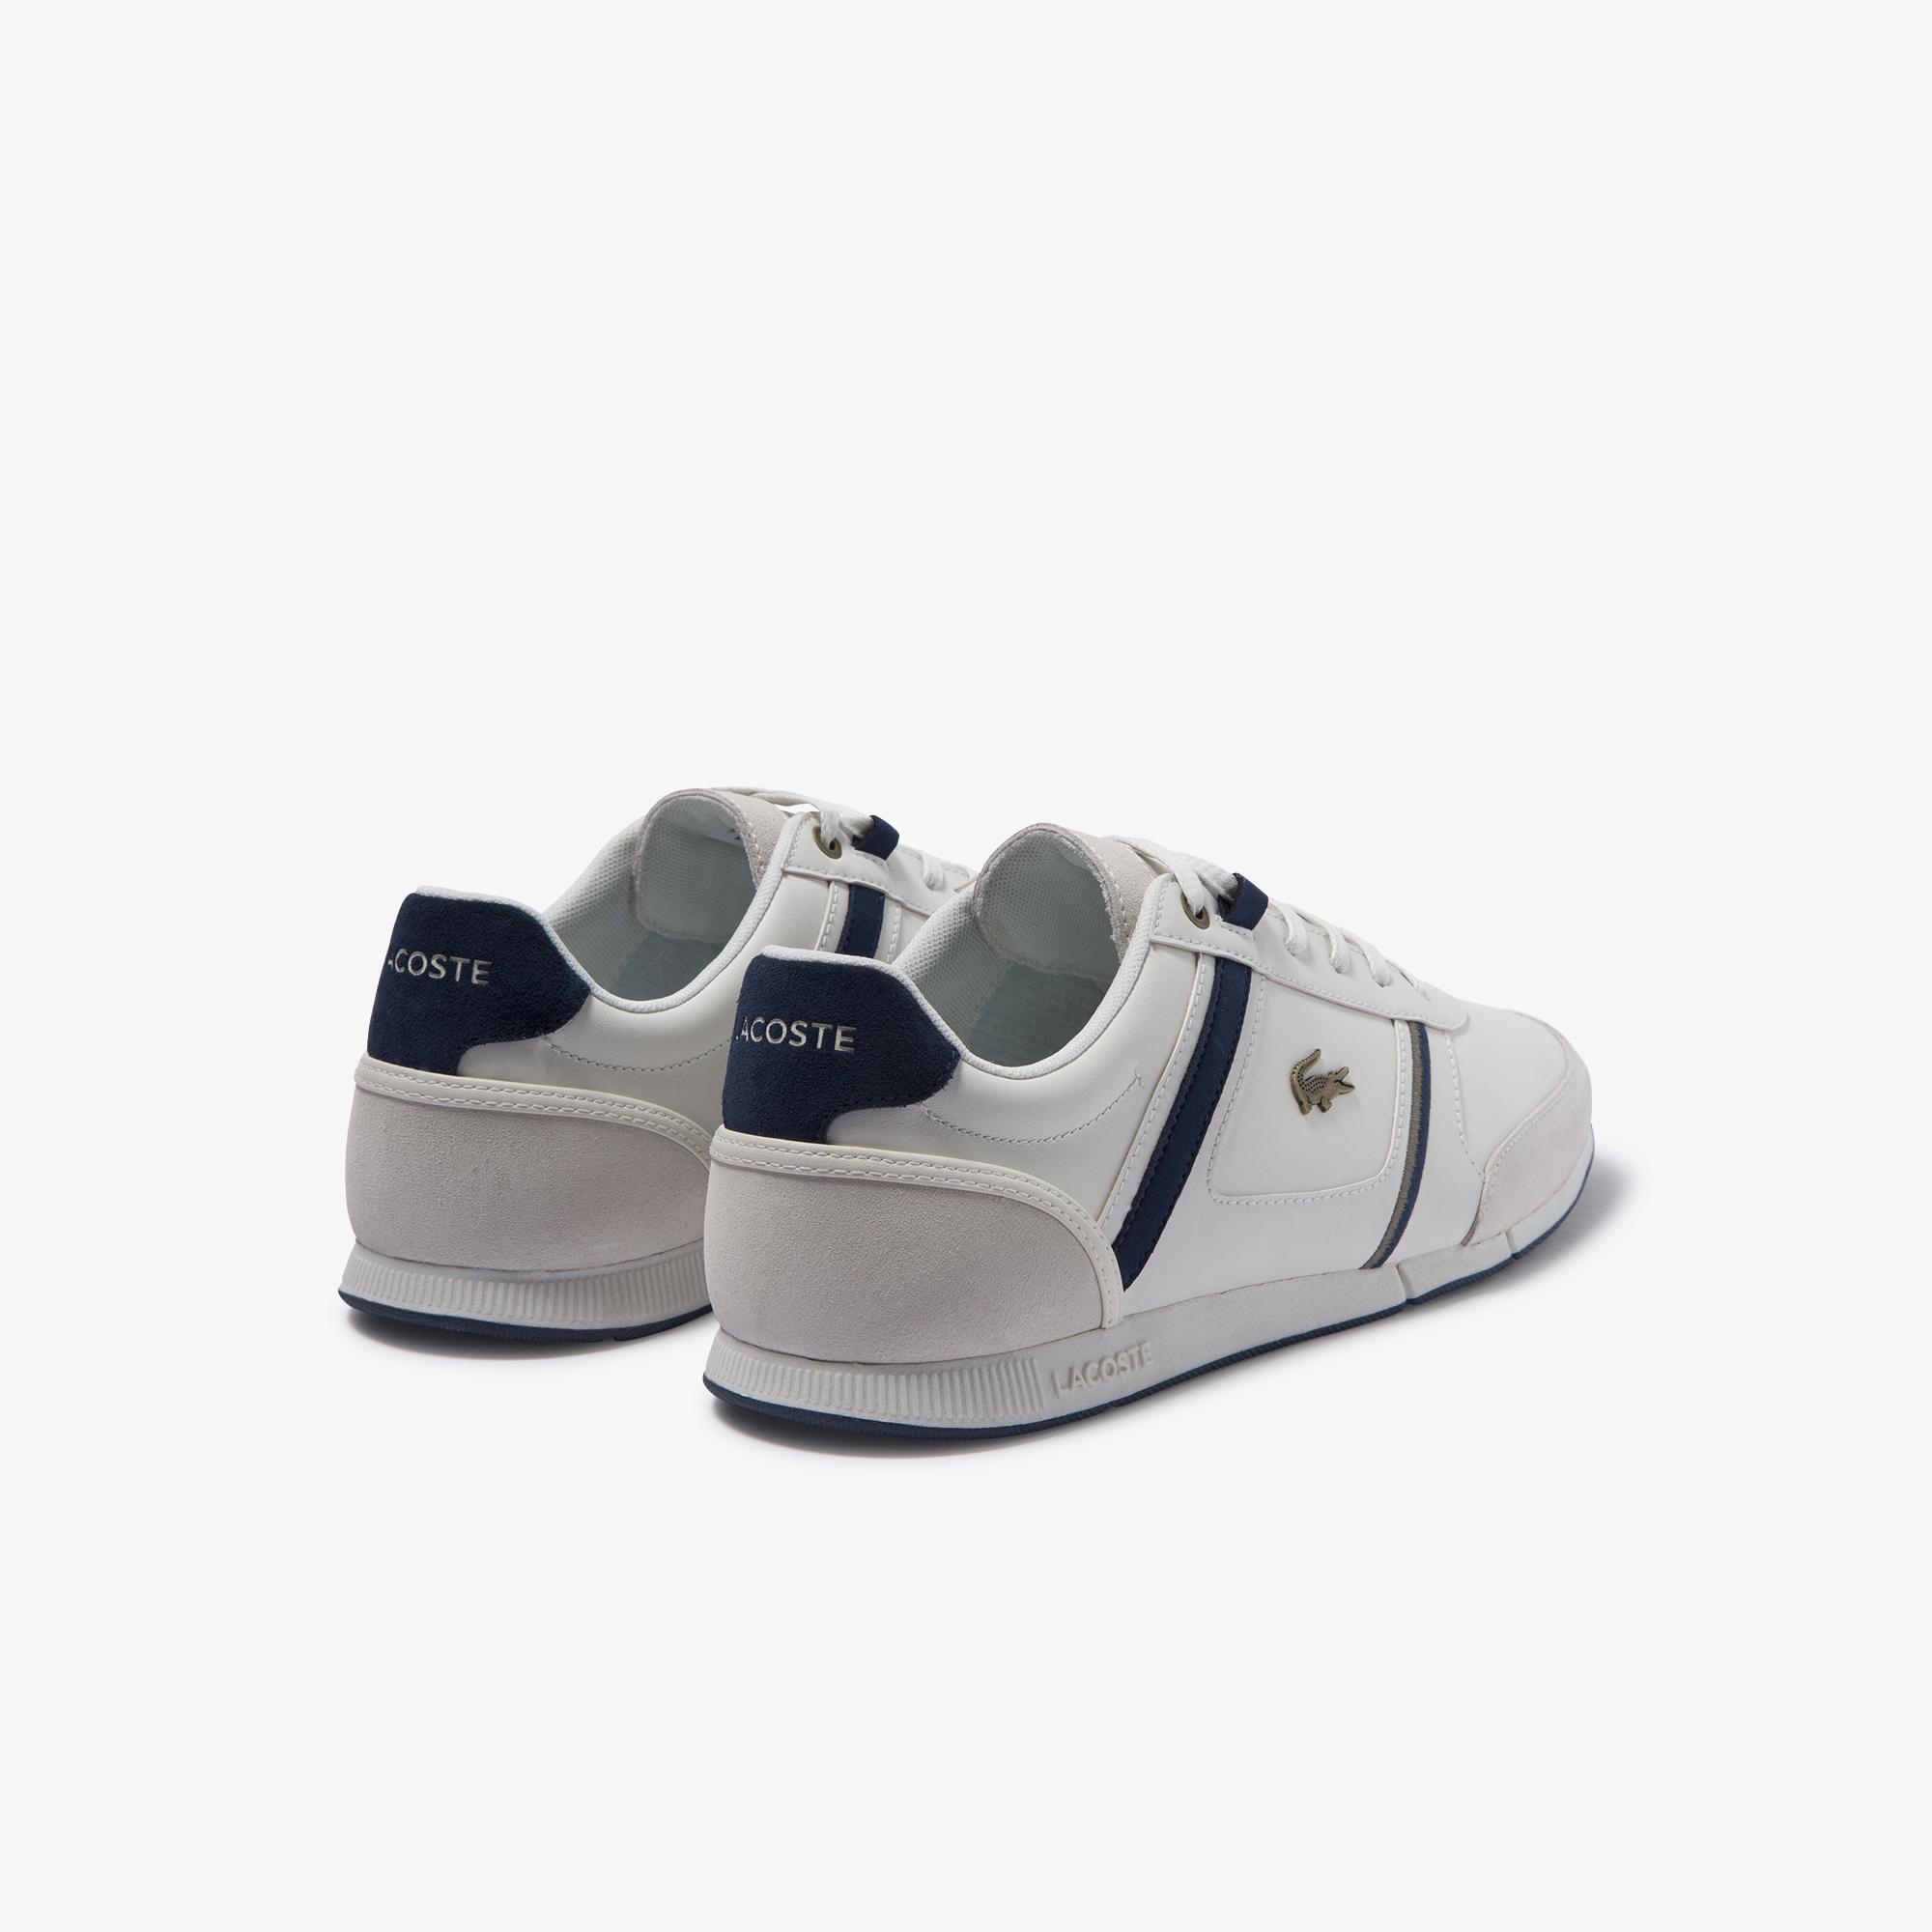 Lacoste Men's Menerva 120 1 Cma Casual Leather Shoes